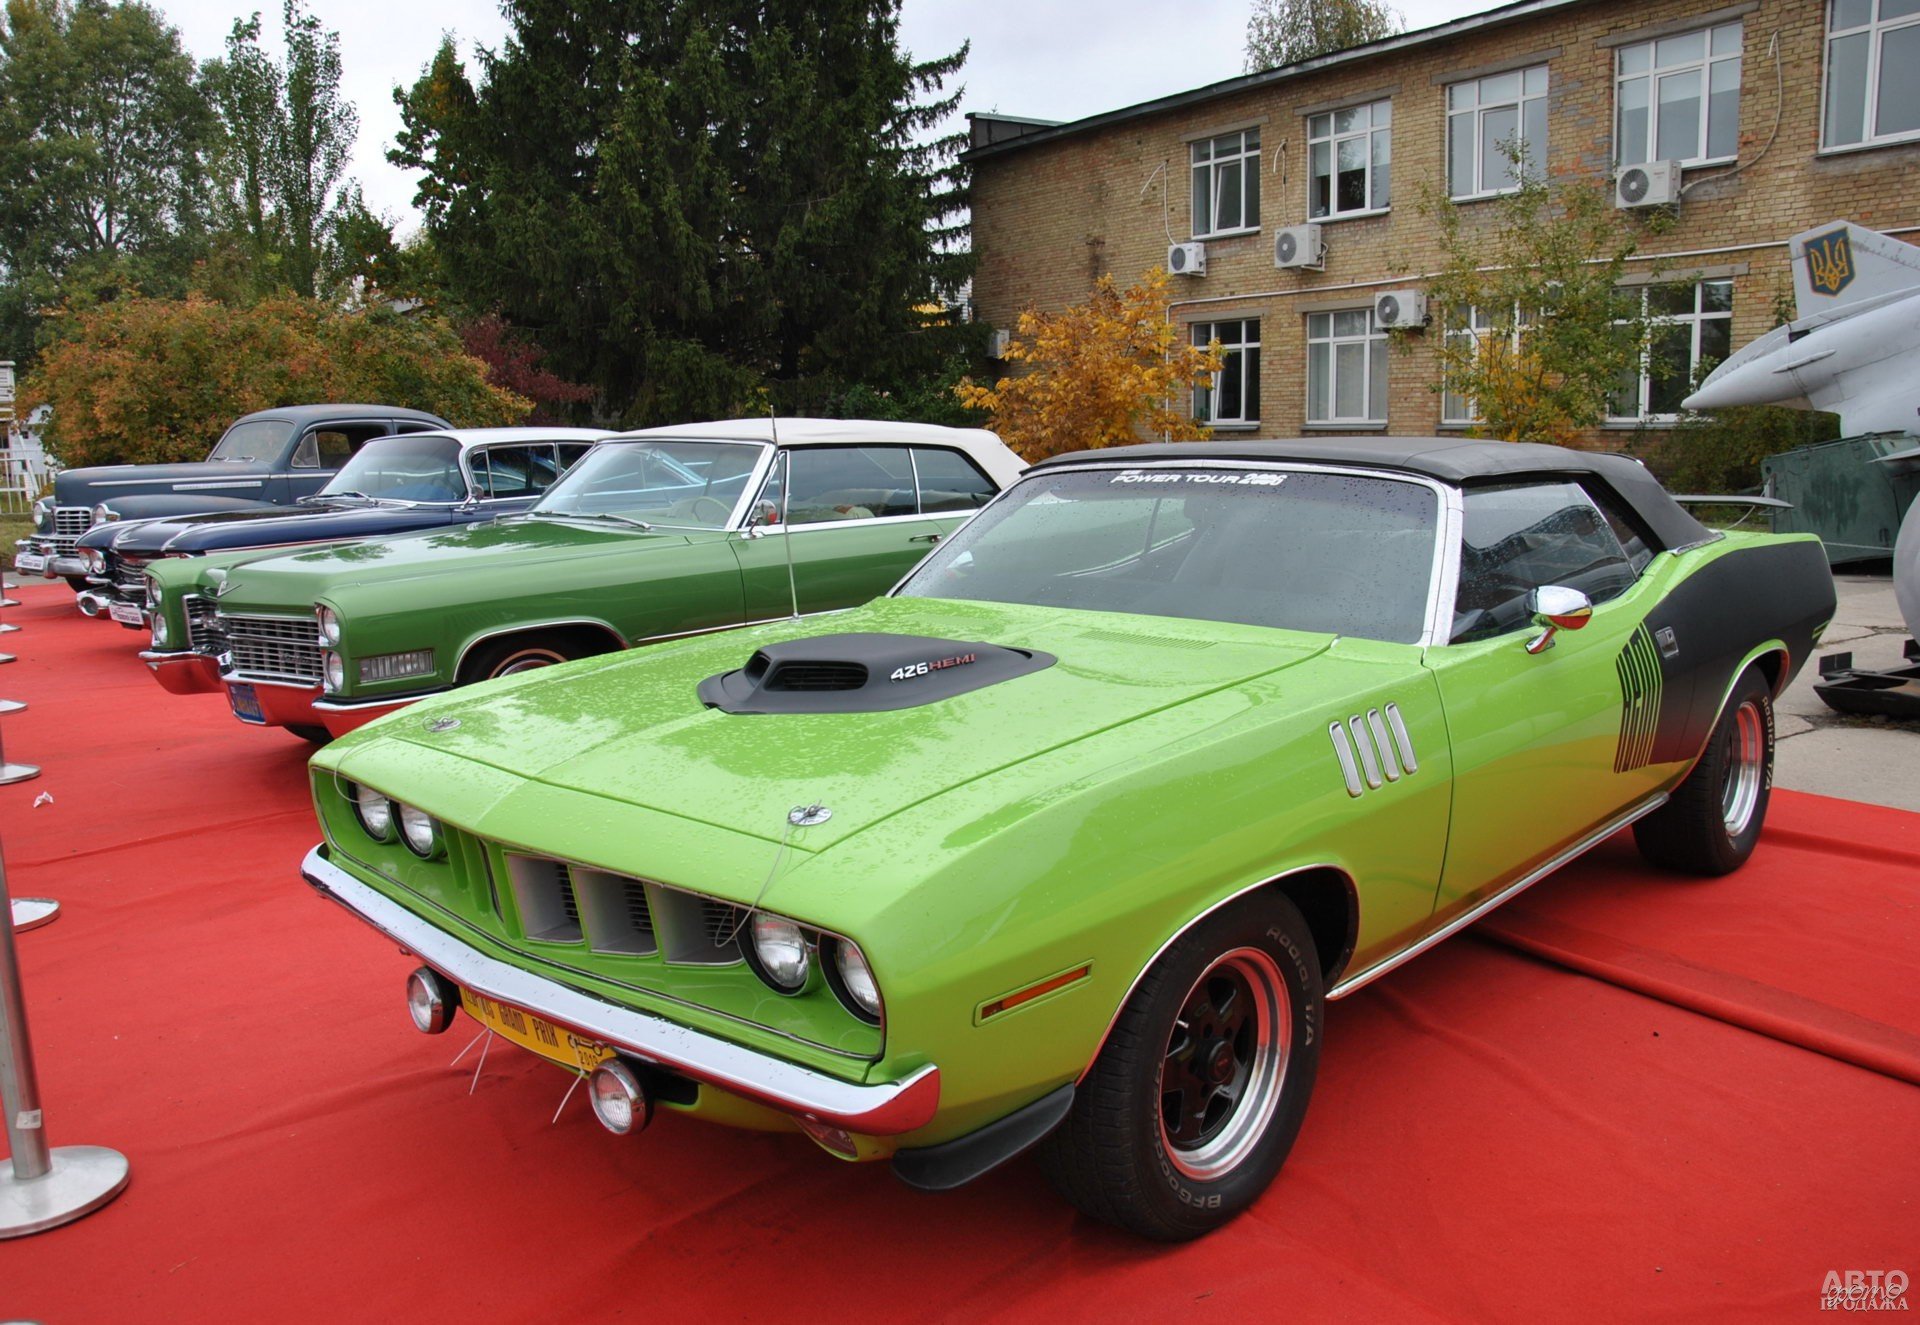 Plymouth Barracuda 1971 года - звезда экспозиции американских авто